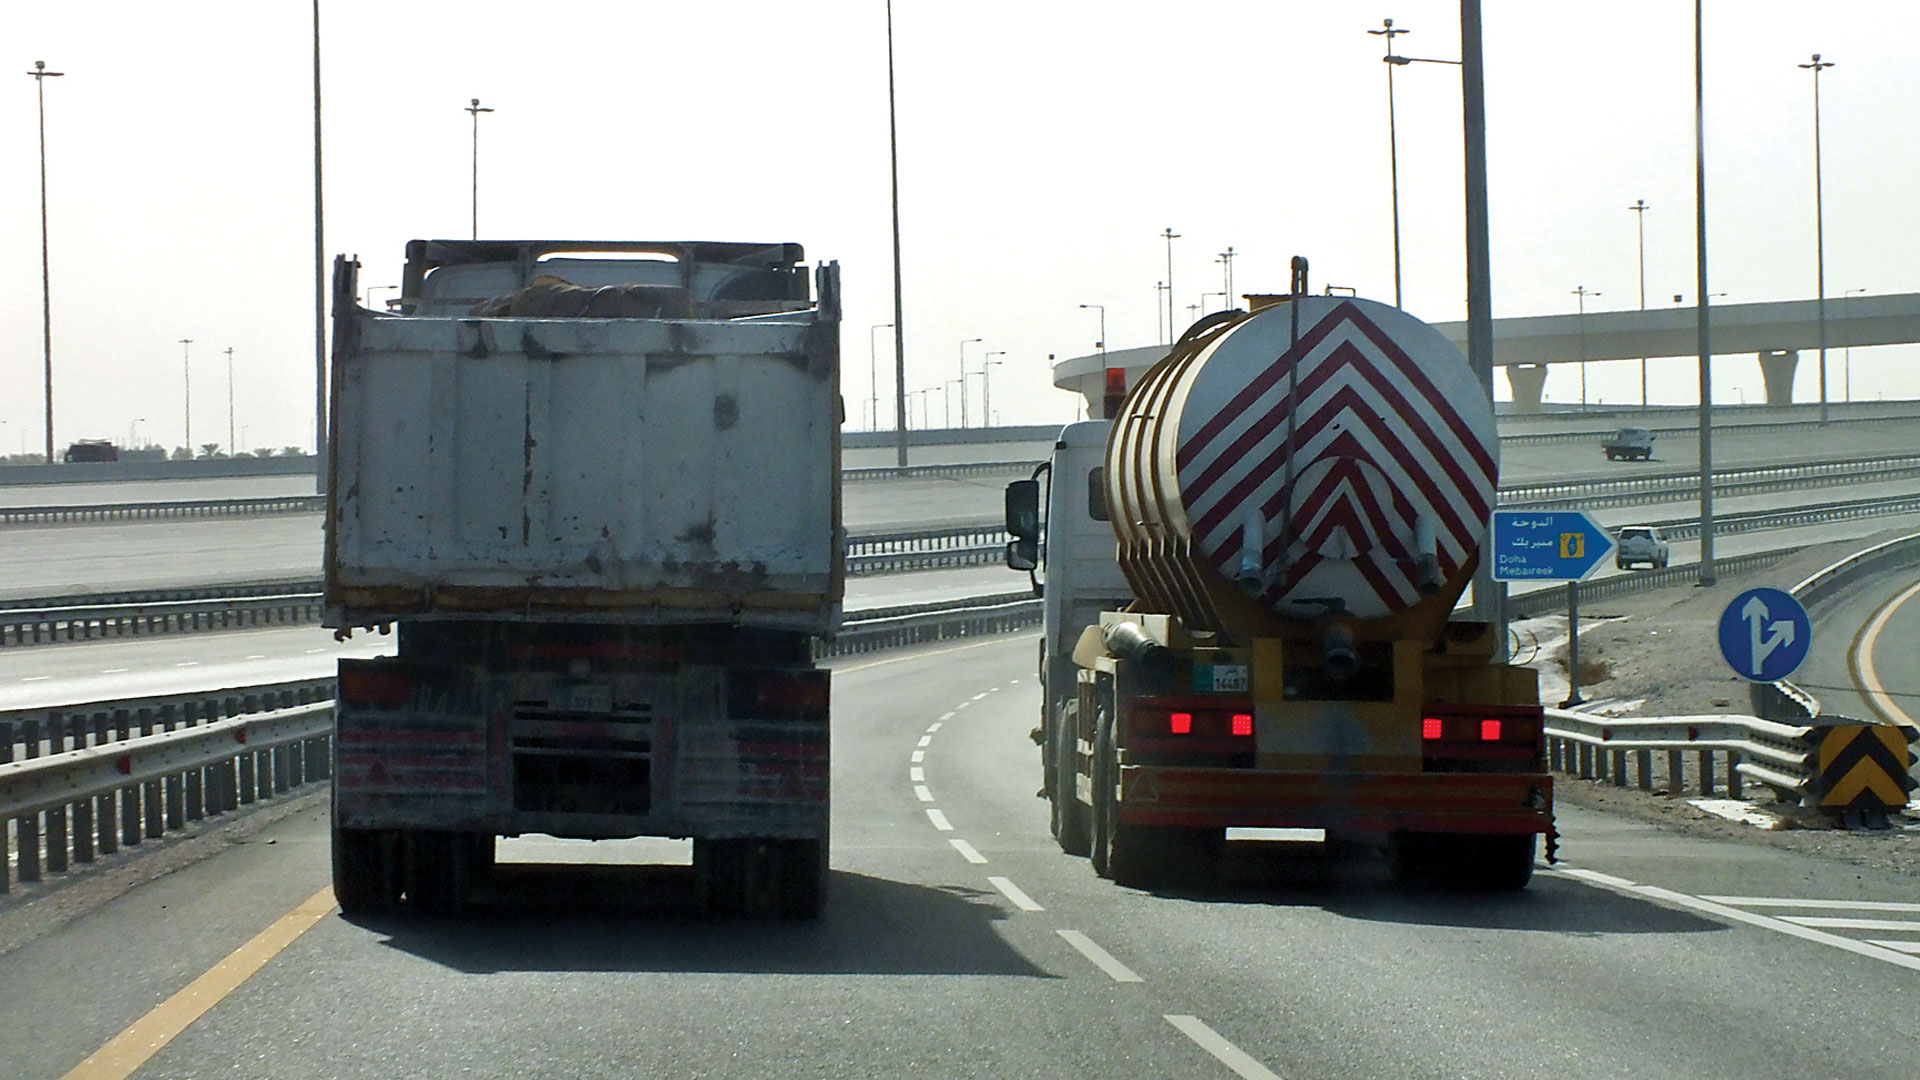 Trucks switching lanes on bridges; a source of danger